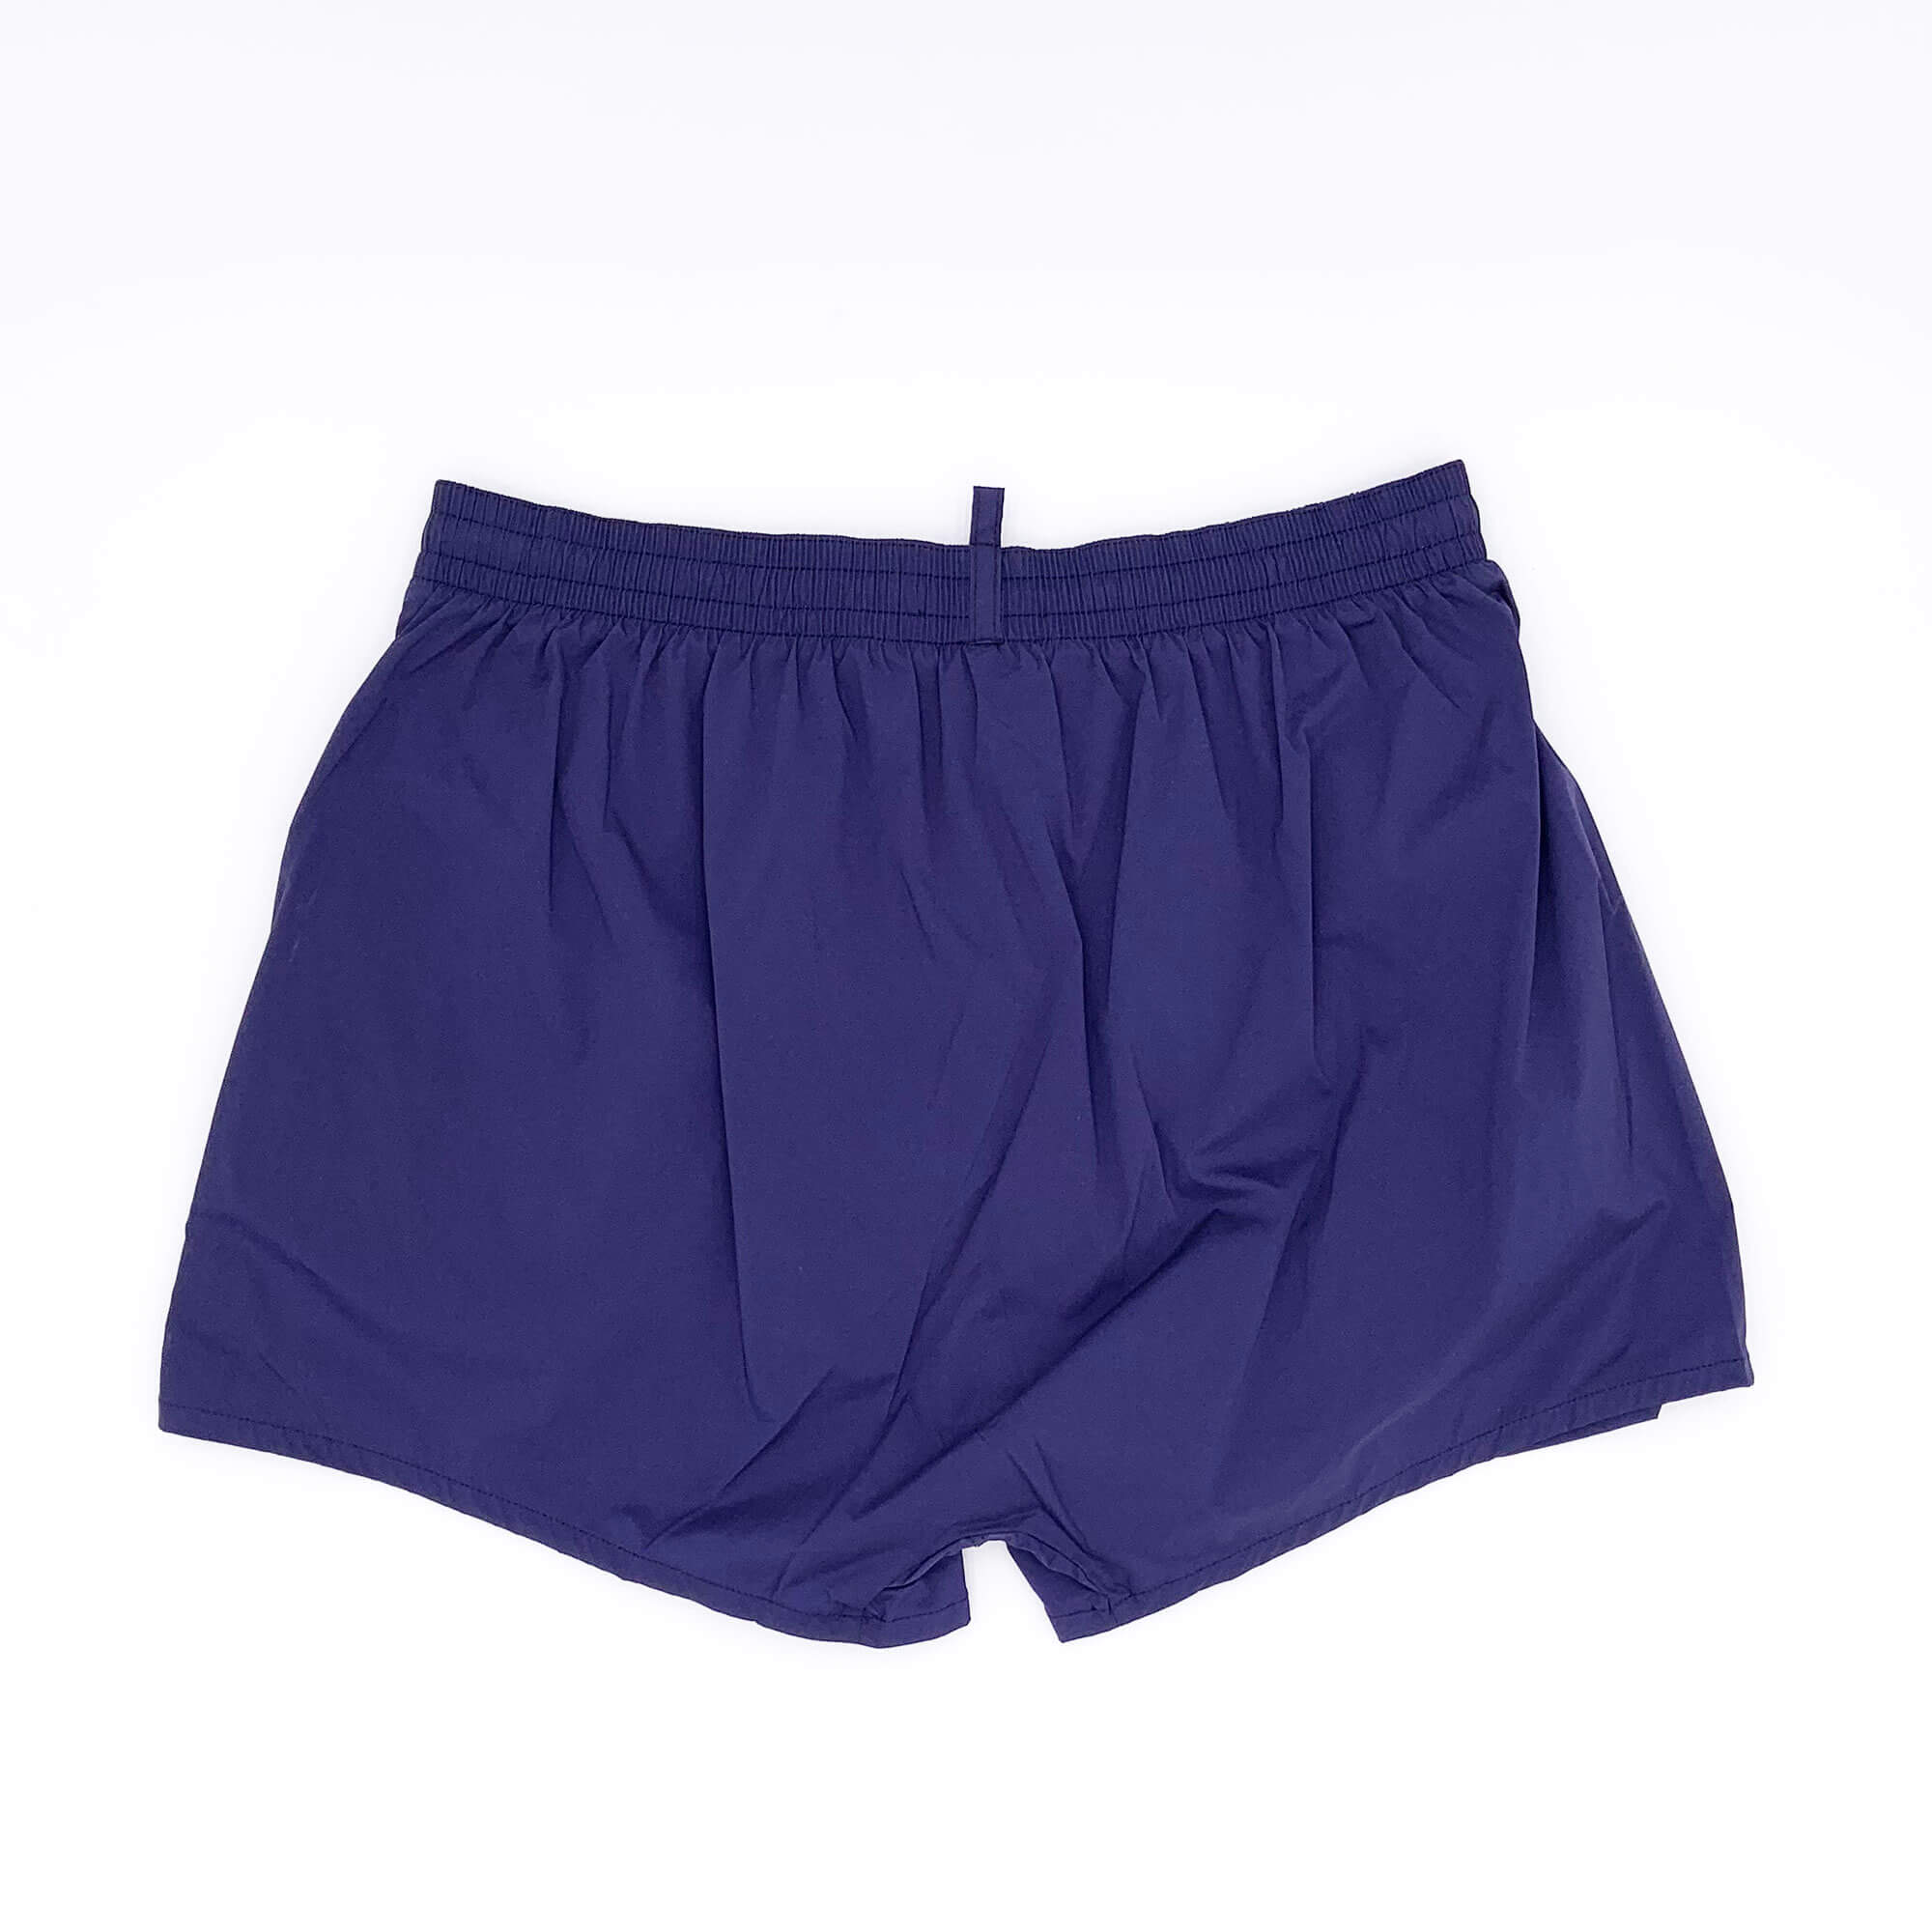 Costume boxer fascia logo - Blu